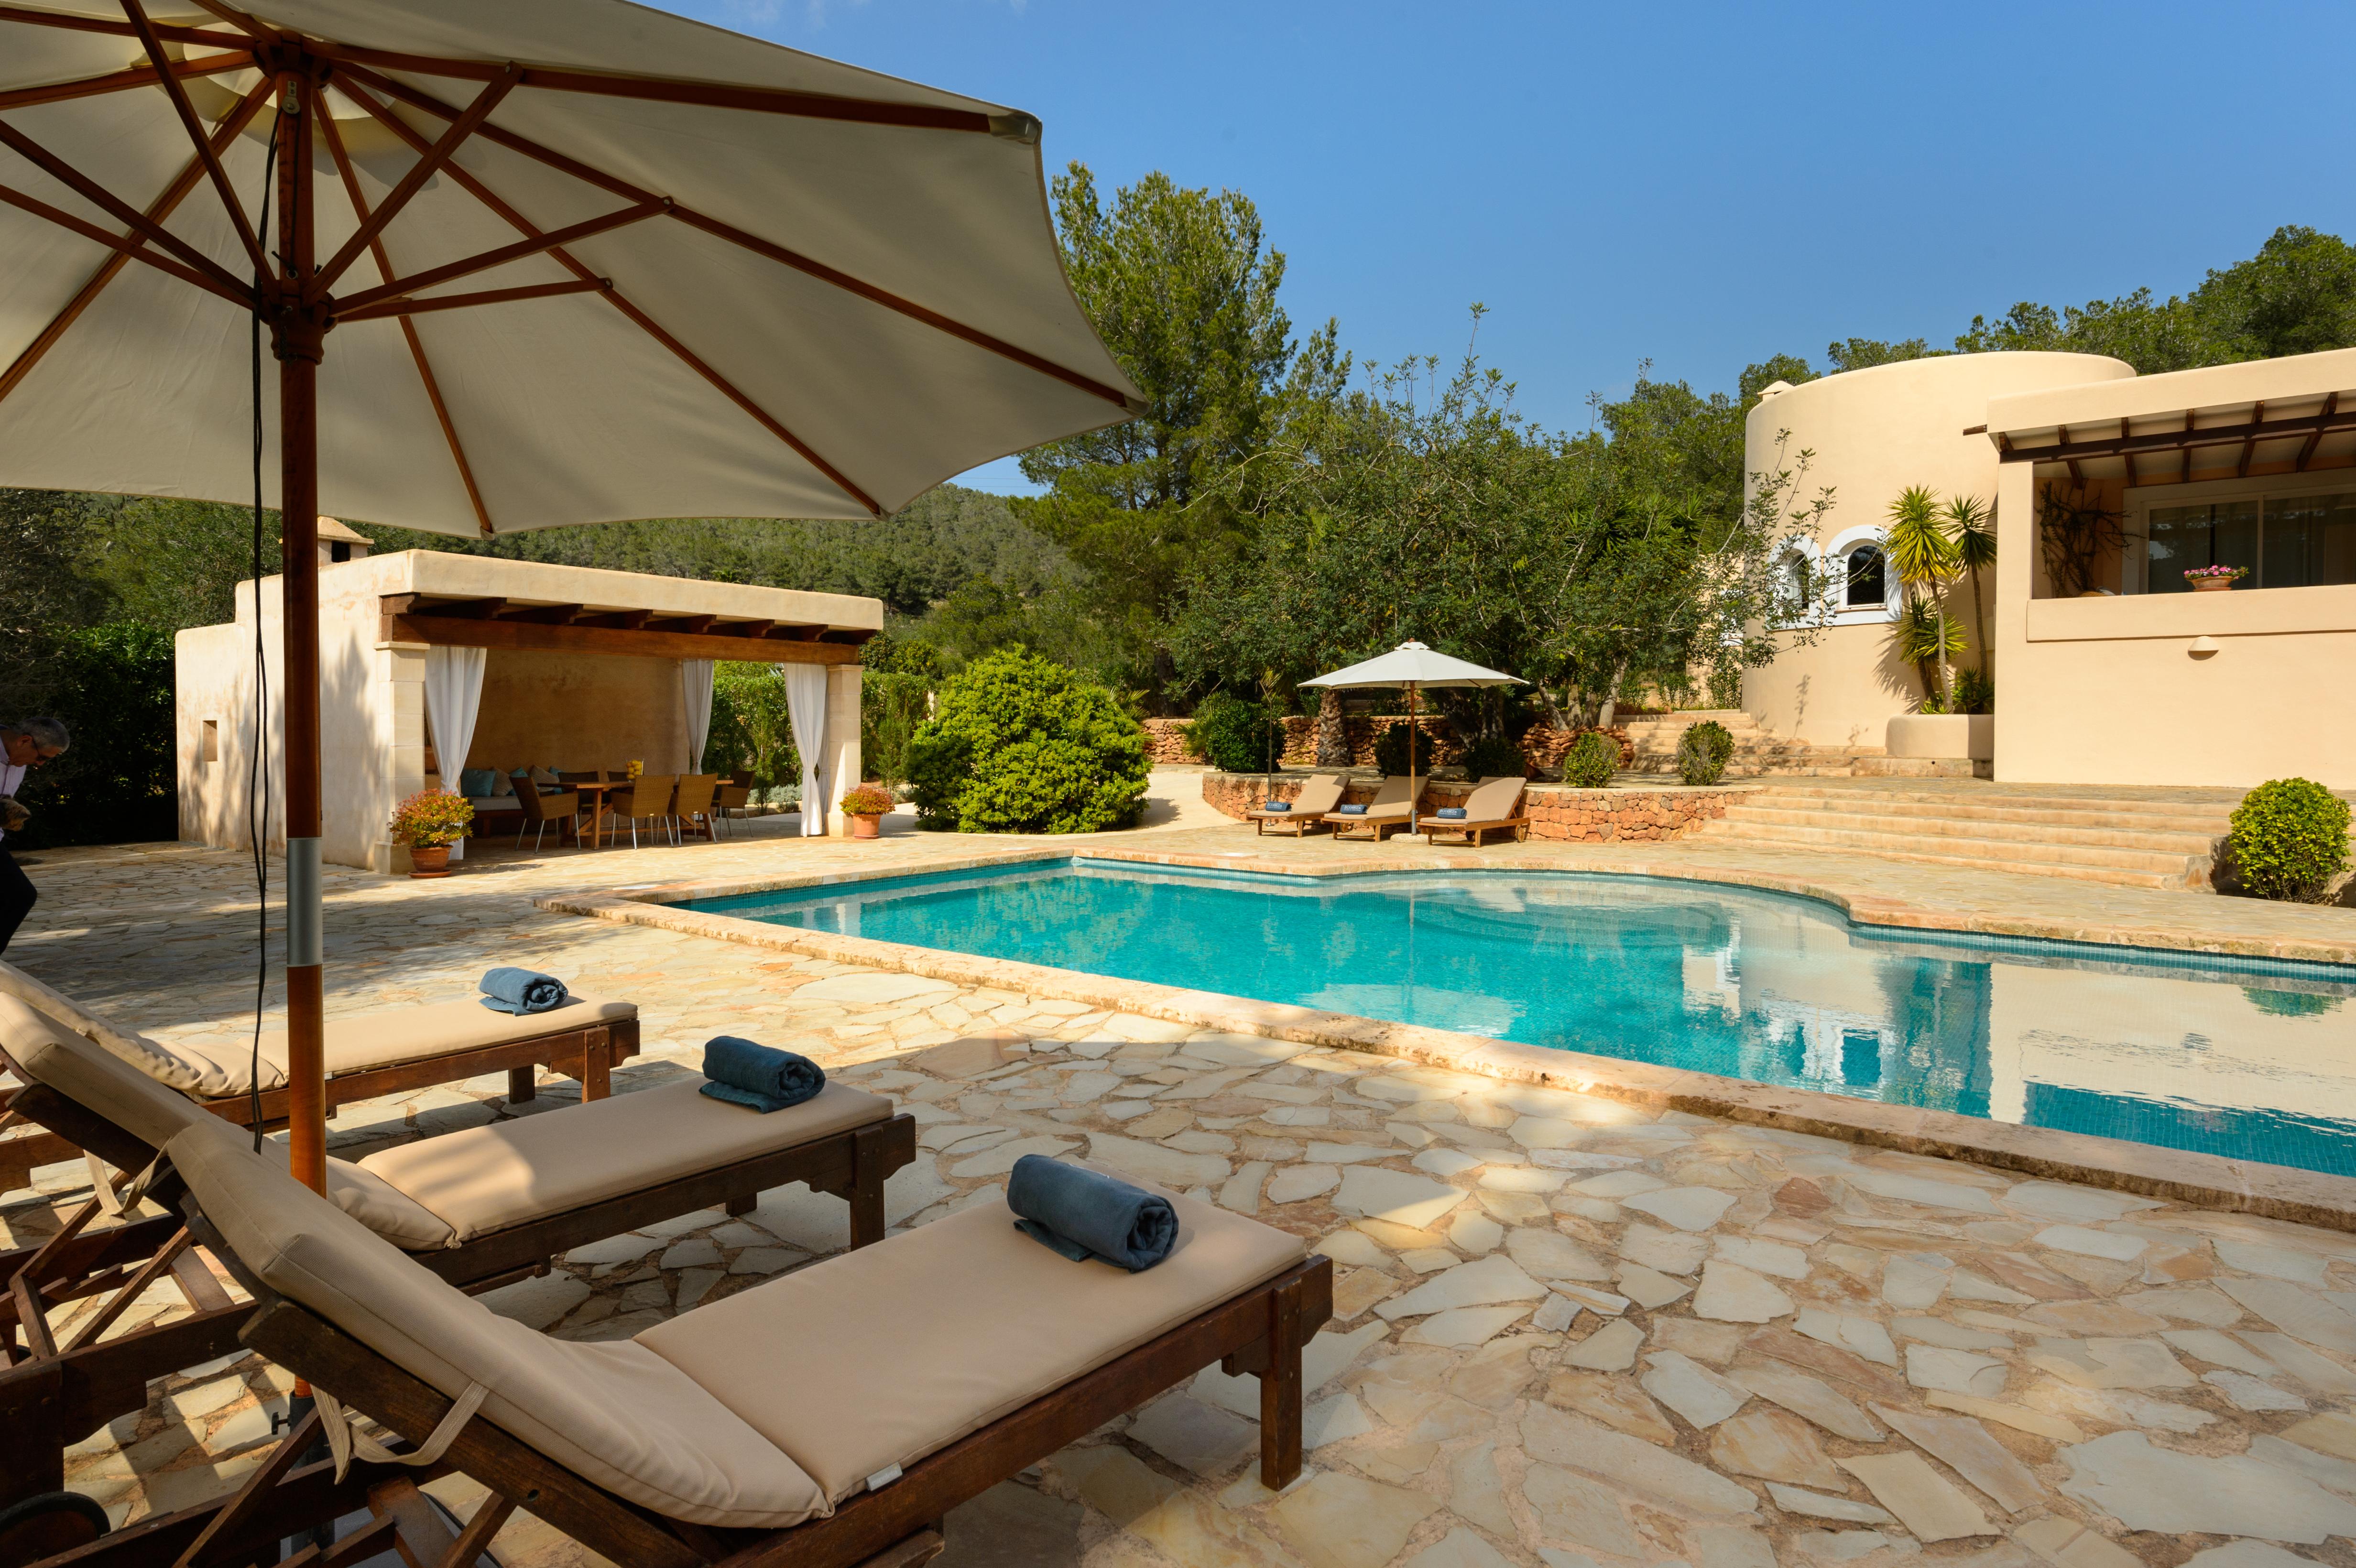 ibiza-luxury-3-bedroom-villa